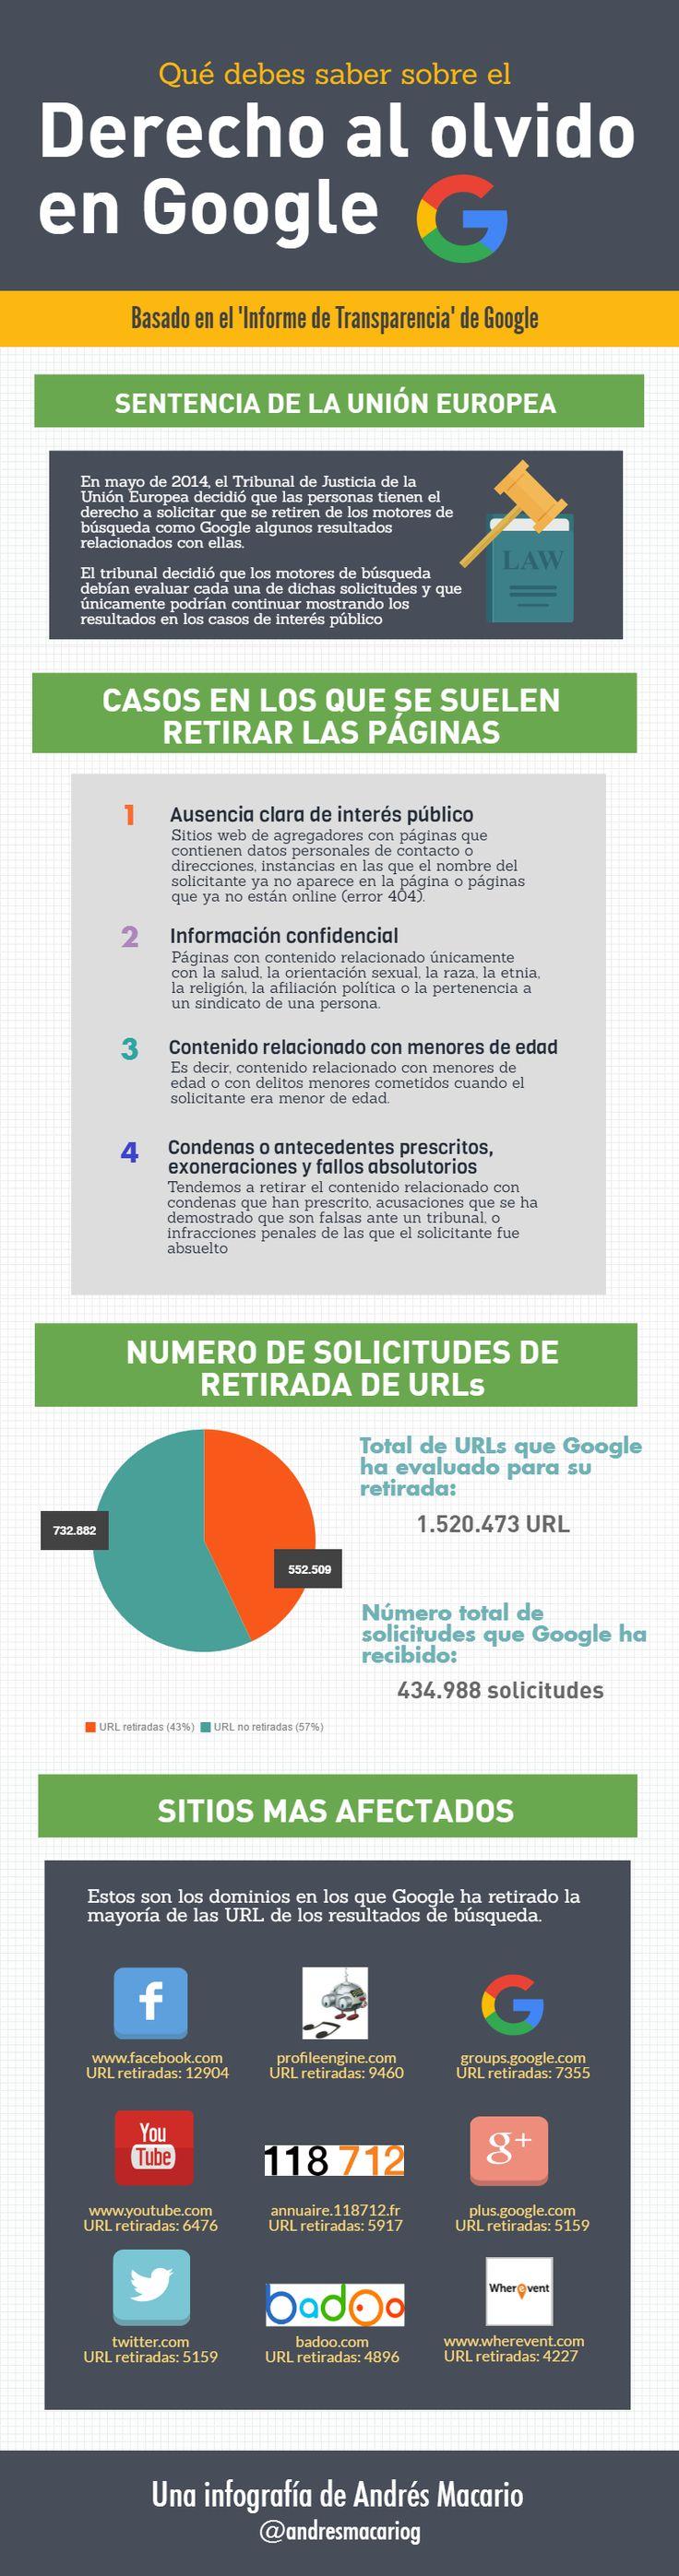 erecho al olvido Infografia de Andres Macario